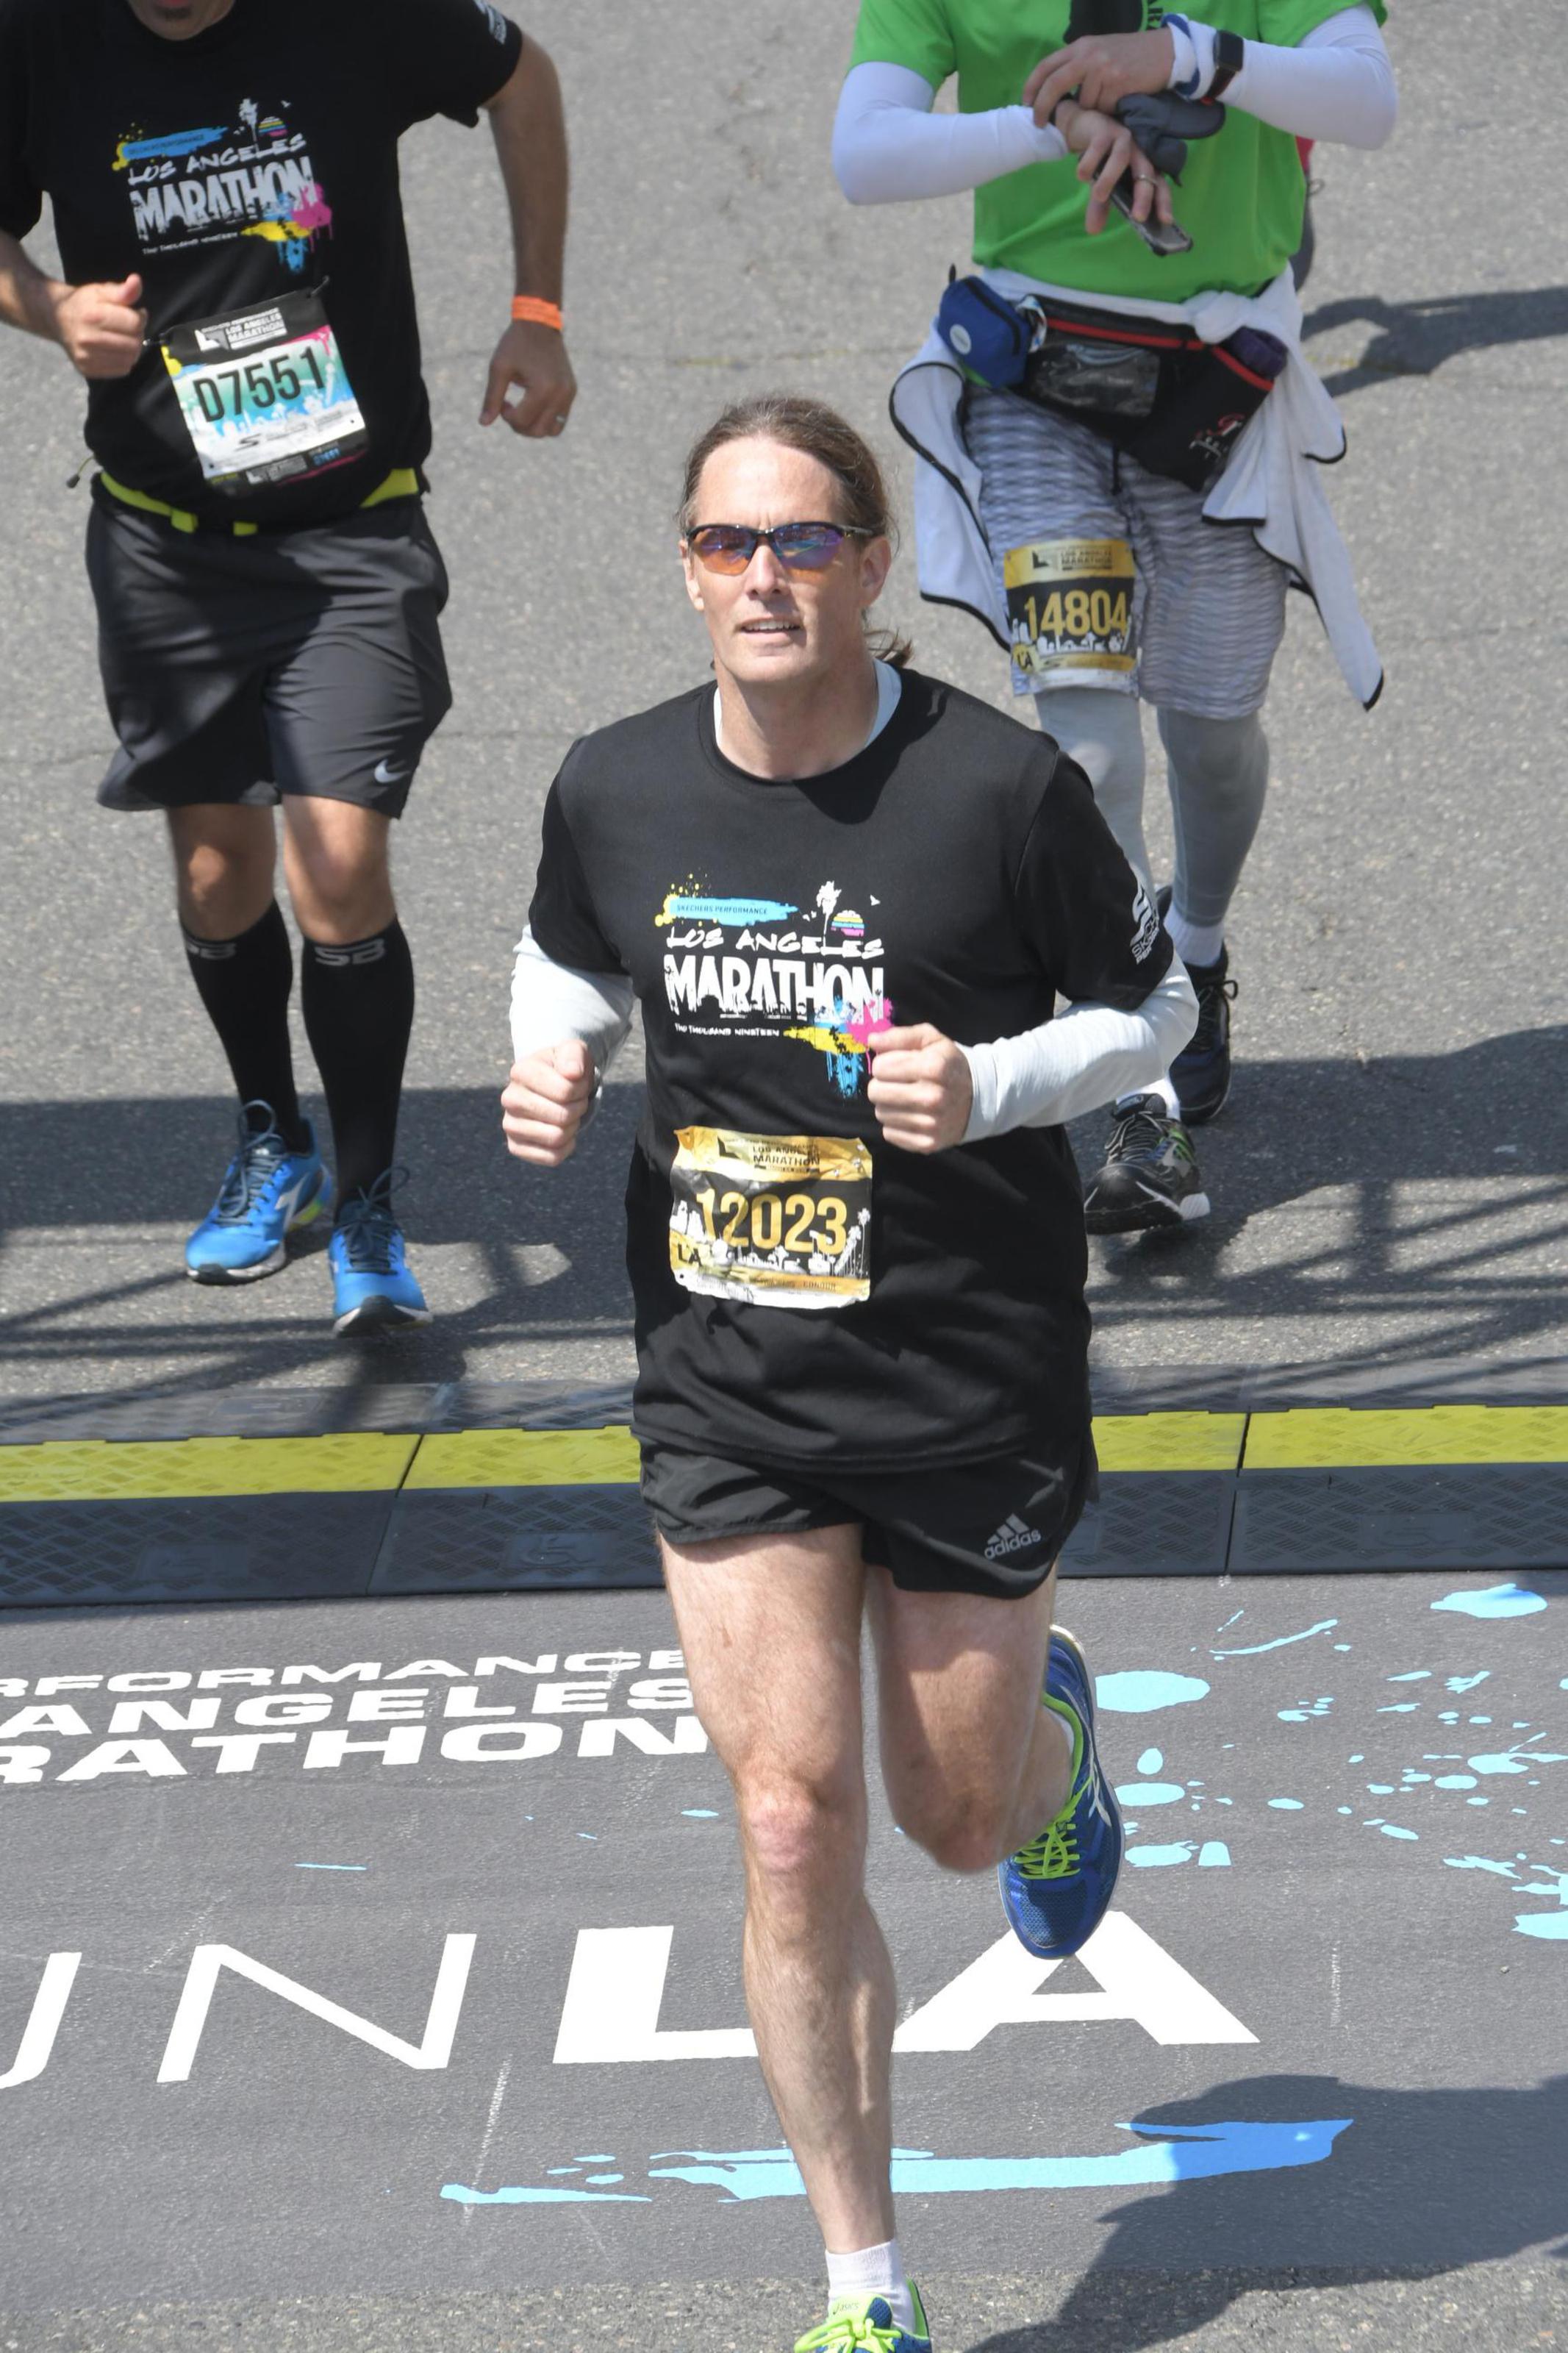 LA-Marathon-March 24-2019-rhb (1).JPG